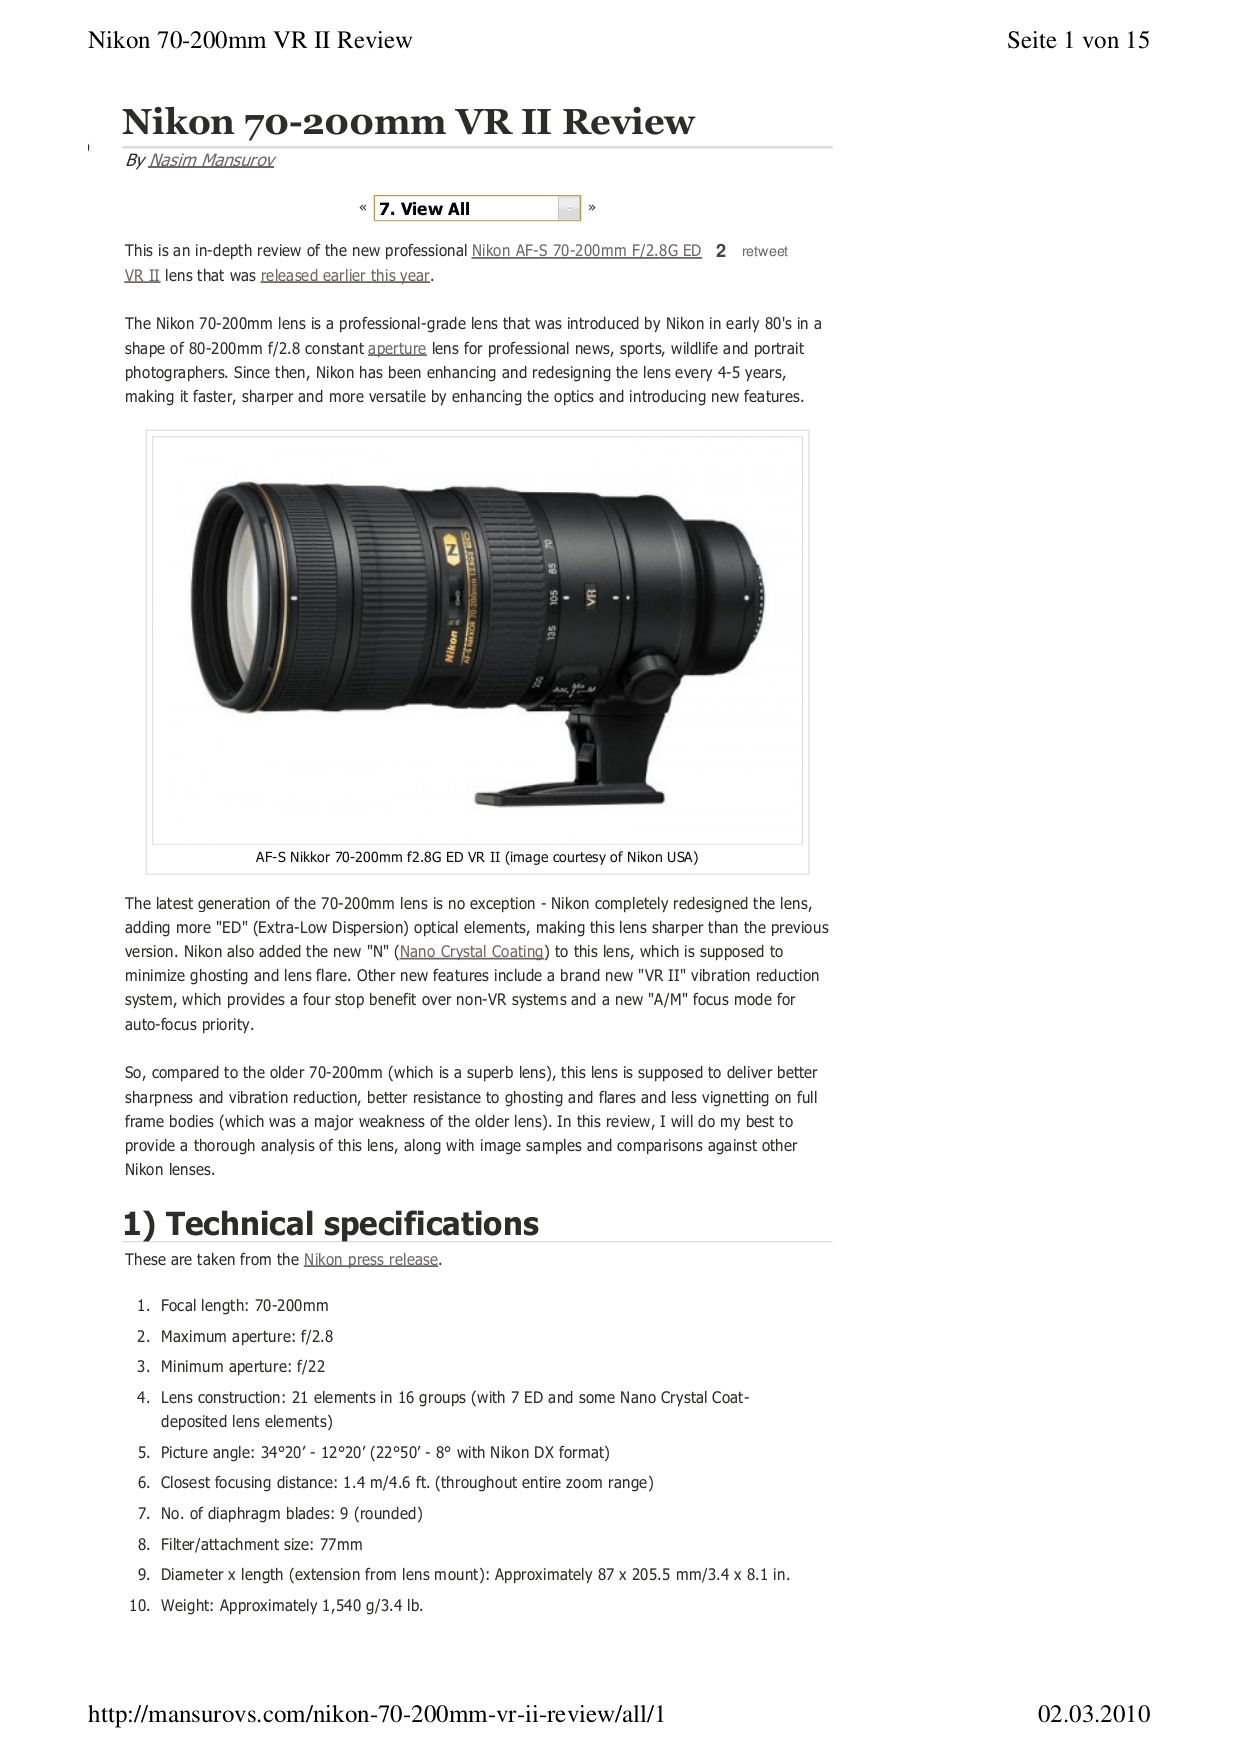 pdf for Nikon Other TC-17E II Camera Teleconverters manual